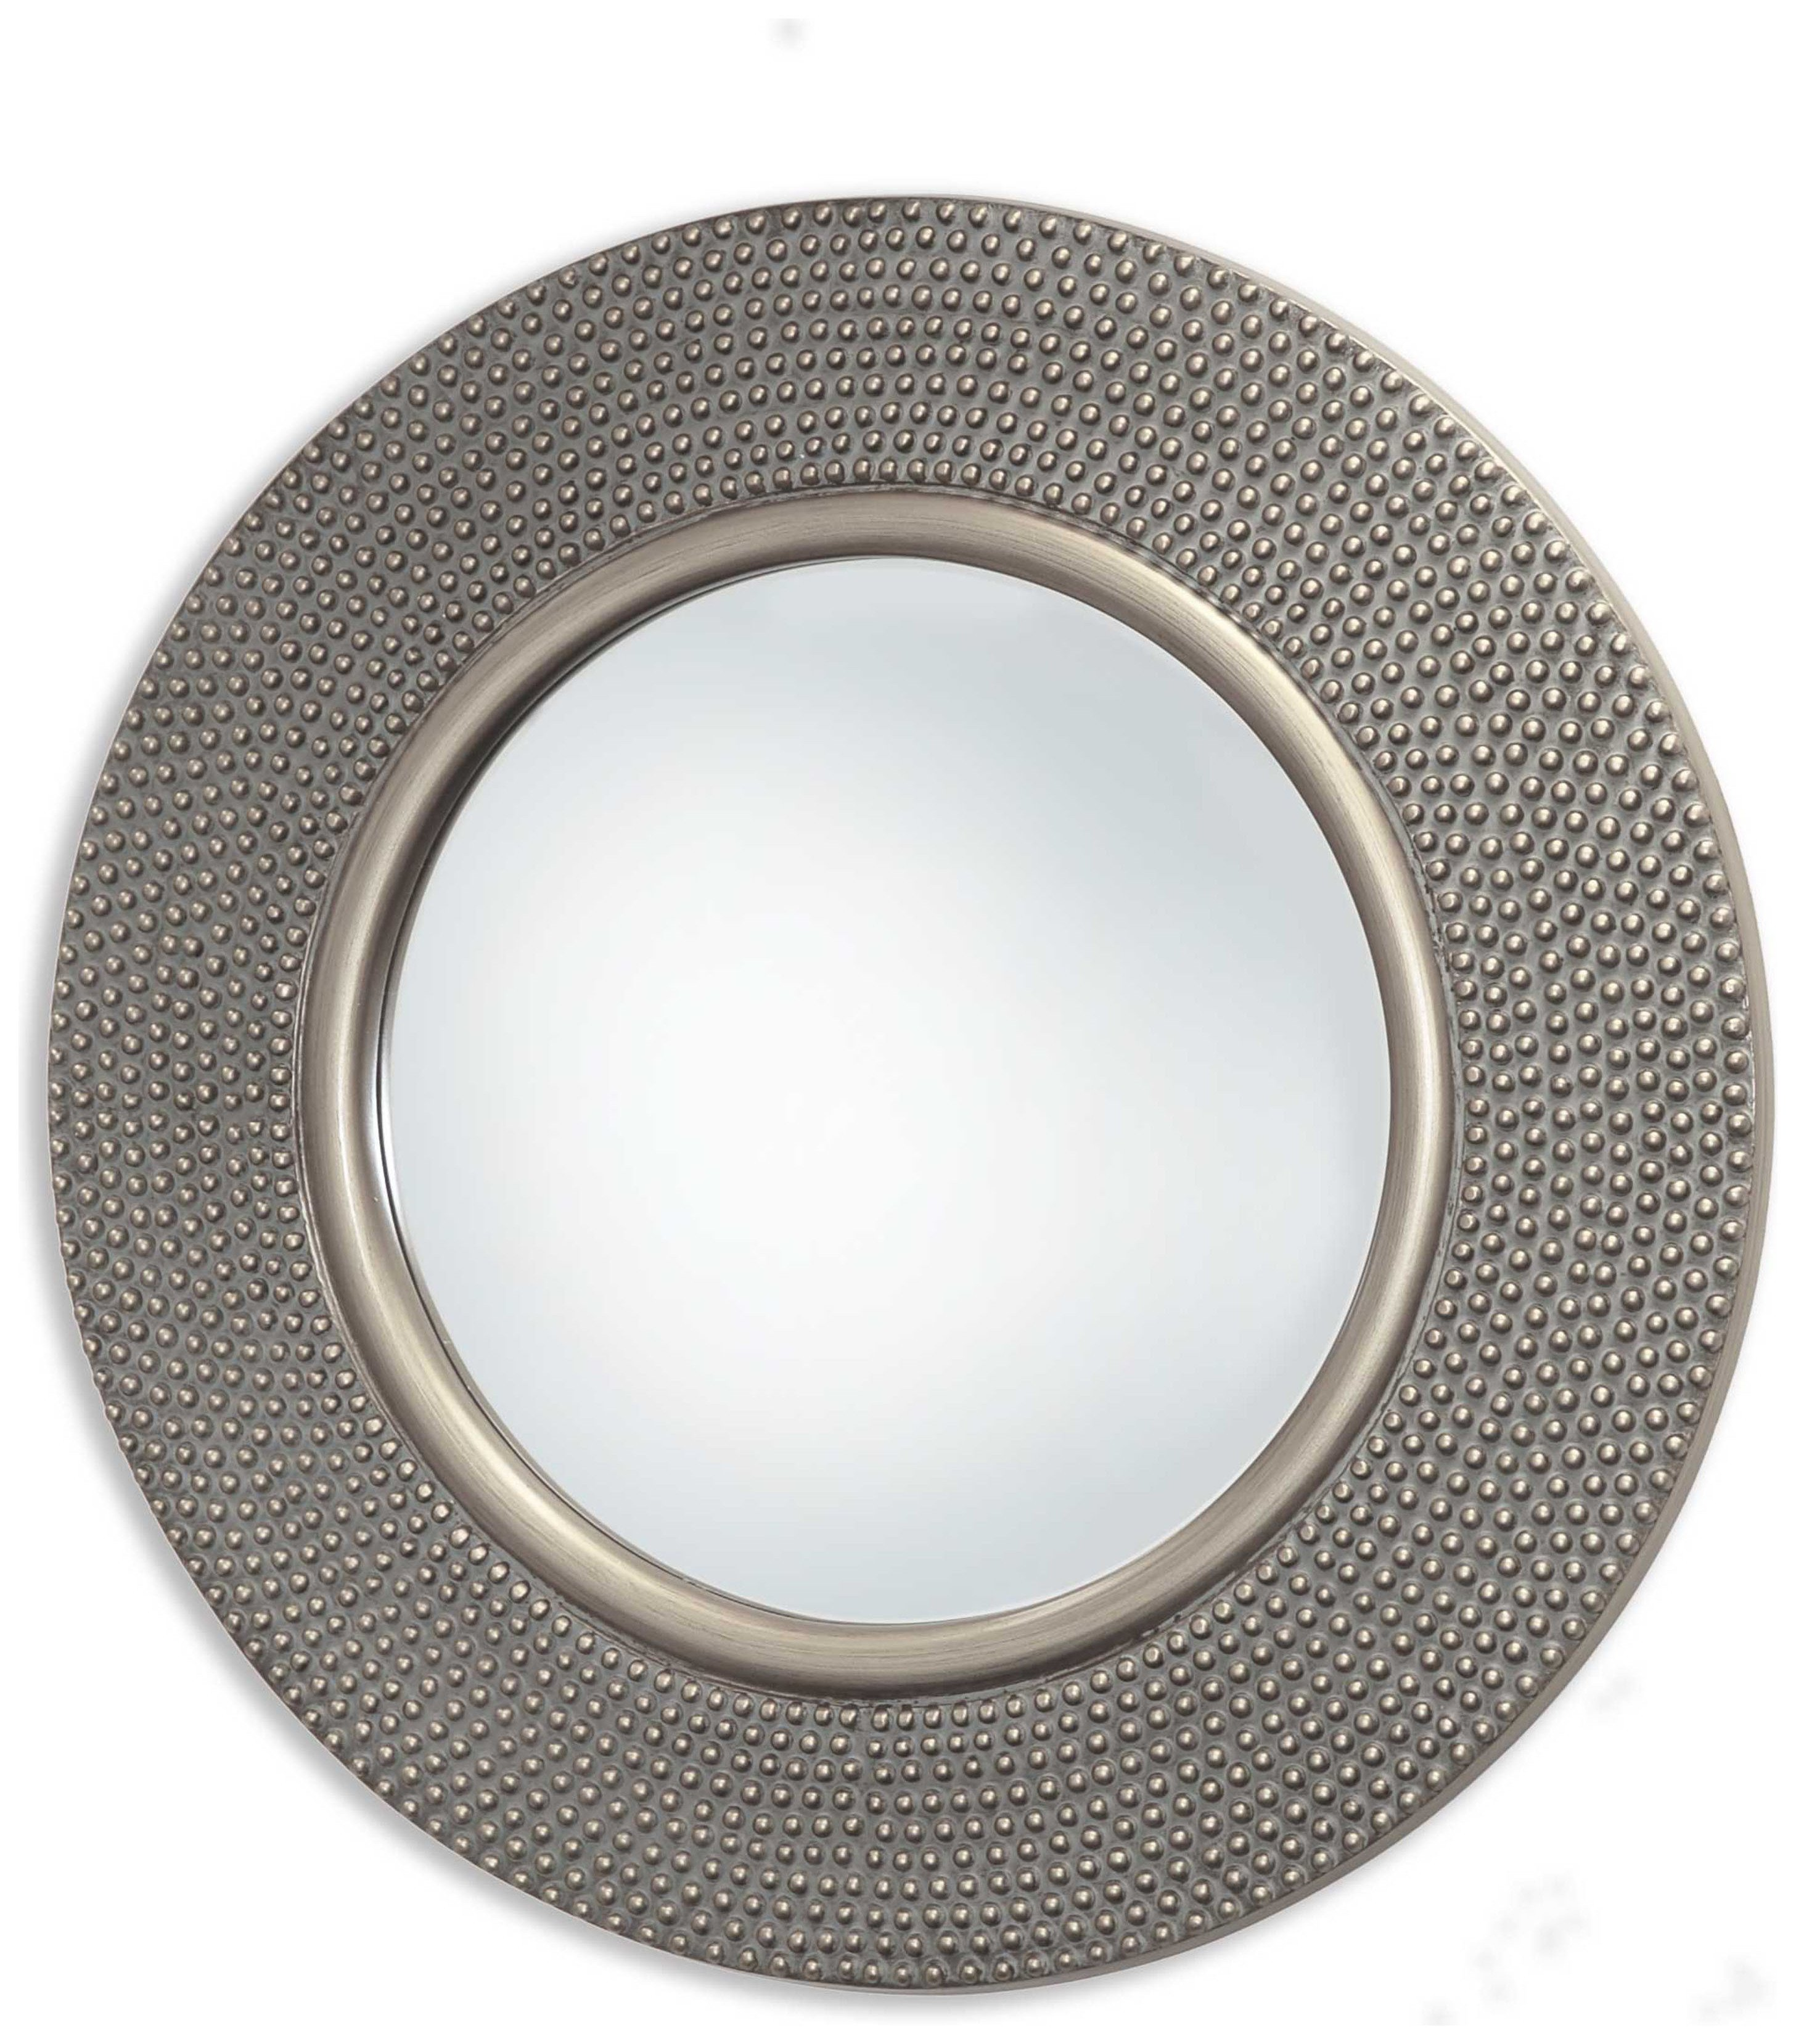 Hammered Mirror - Silver Effect